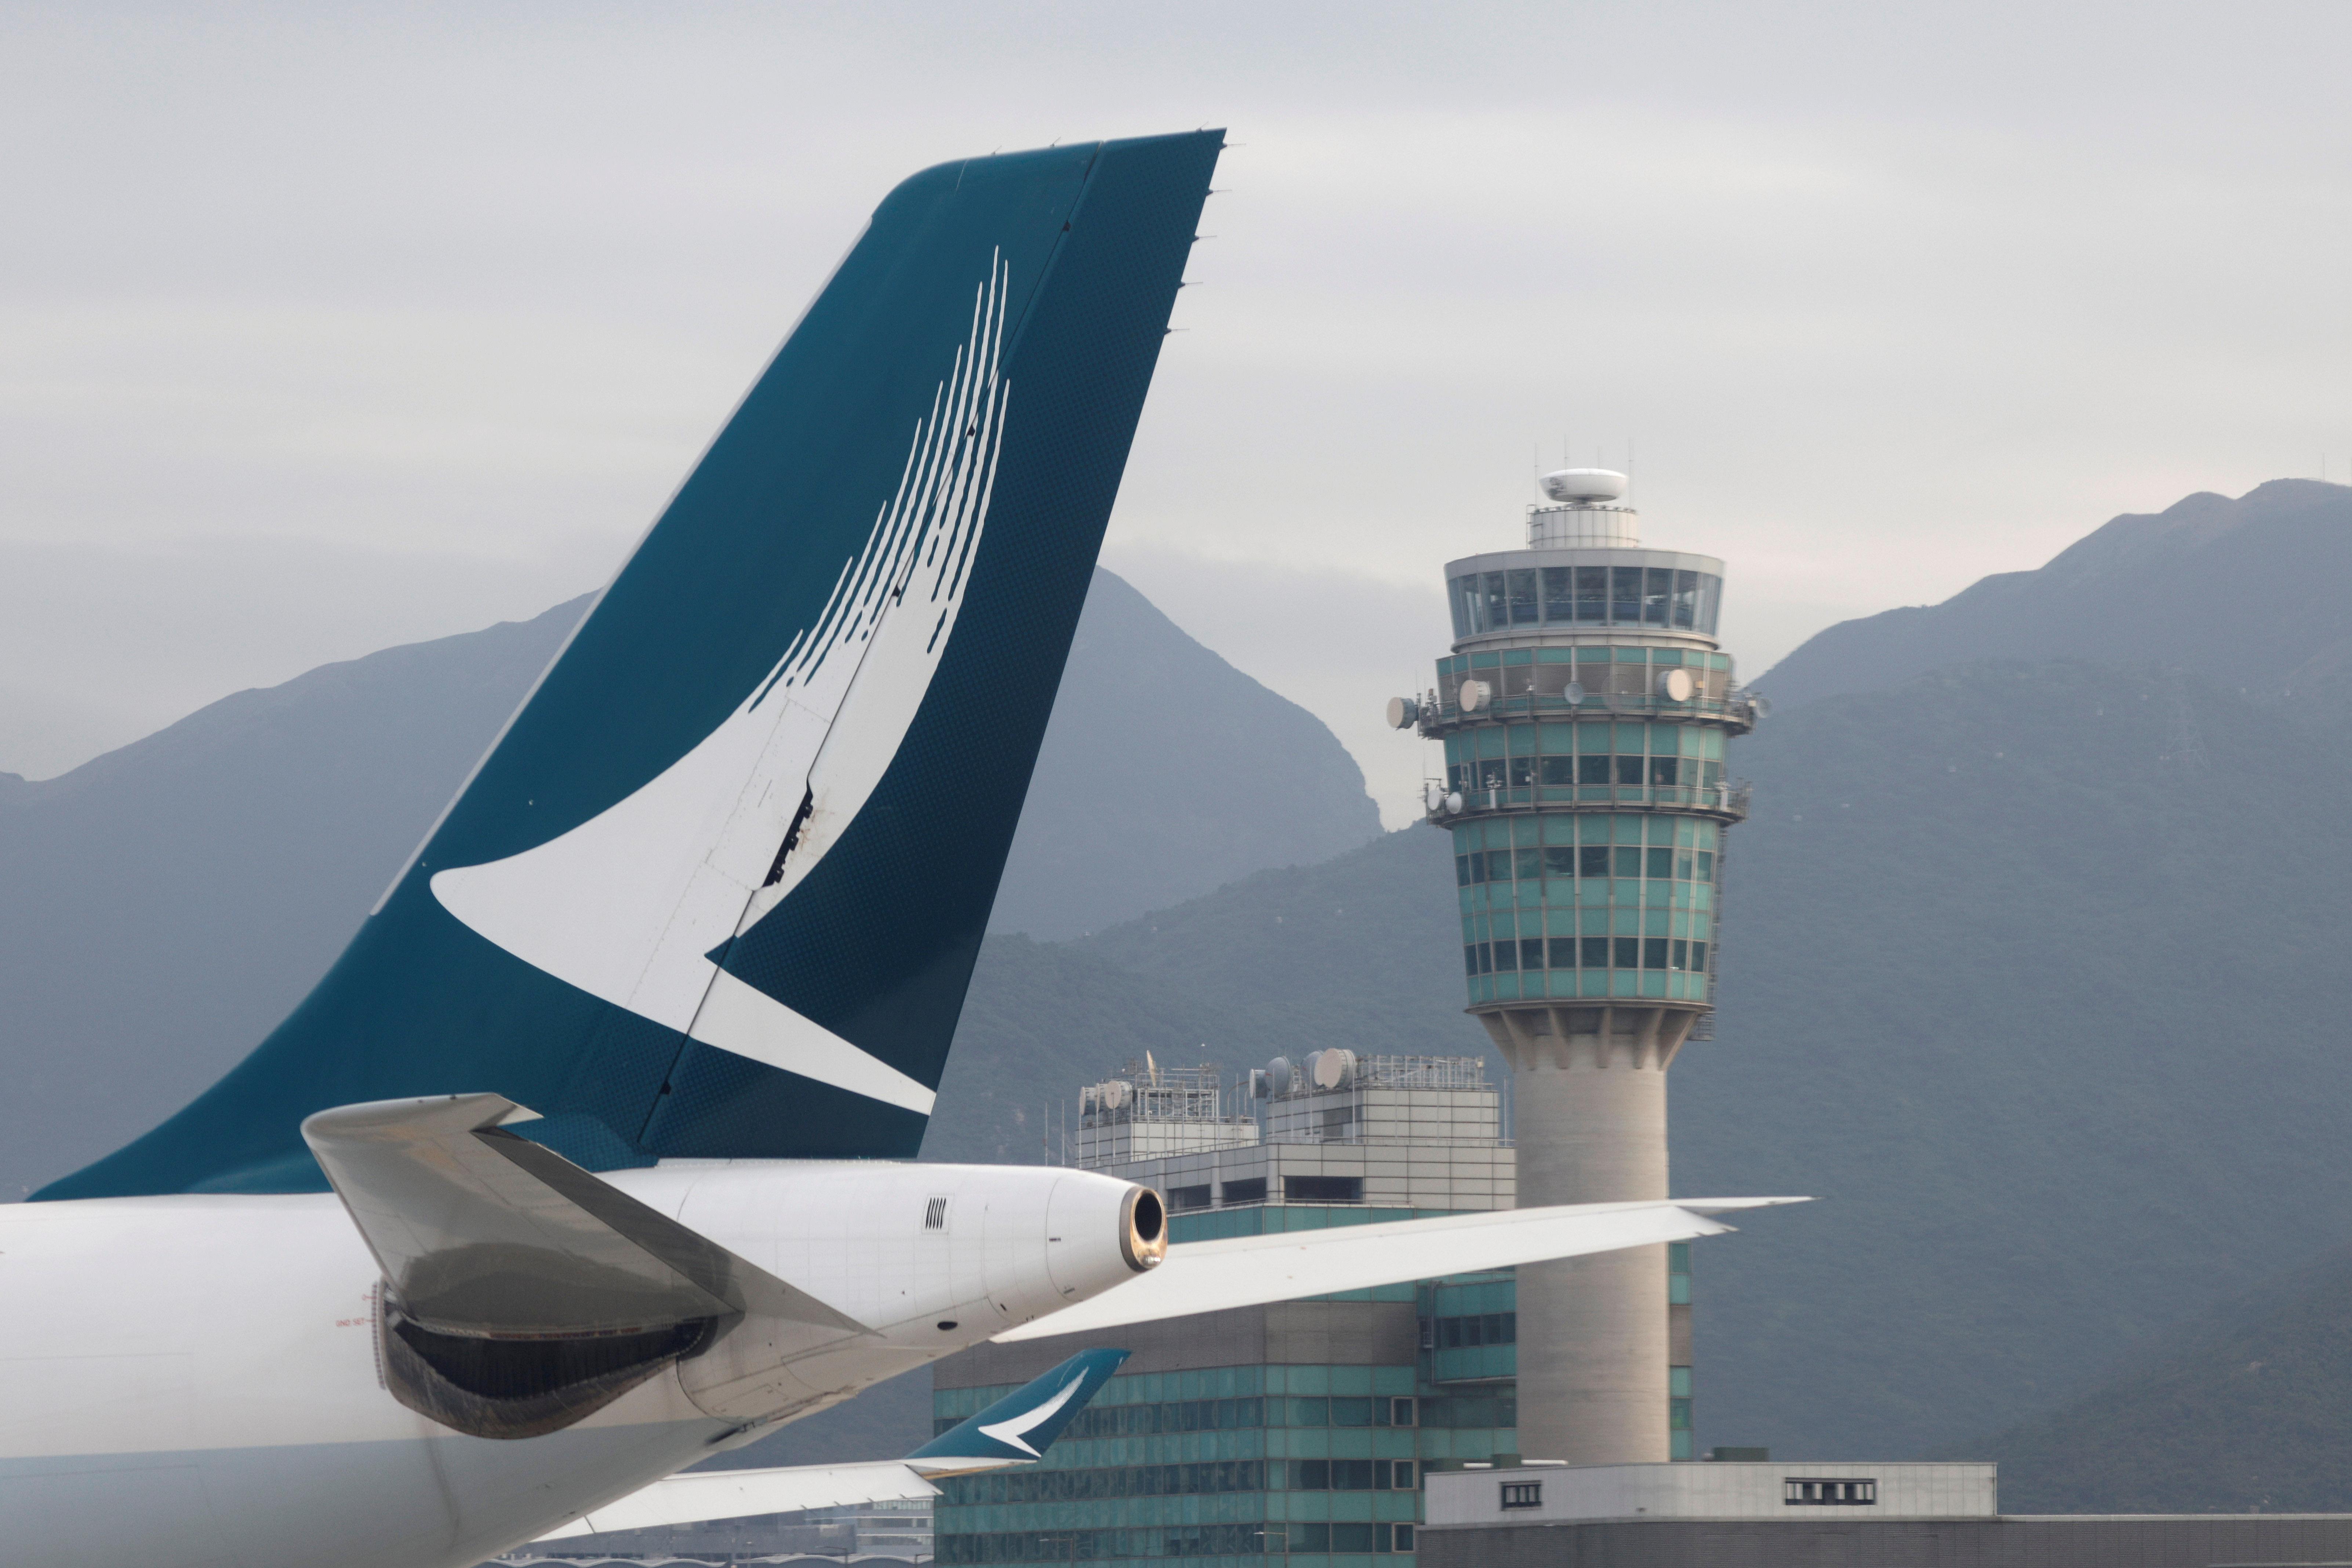 A Cathay Pacific aircraft is seen in front of an air traffic control tower at the Hong Kong International Airport, Hong Kong, China October 24 2020. REUTERS/Tyrone Siu/File Photo